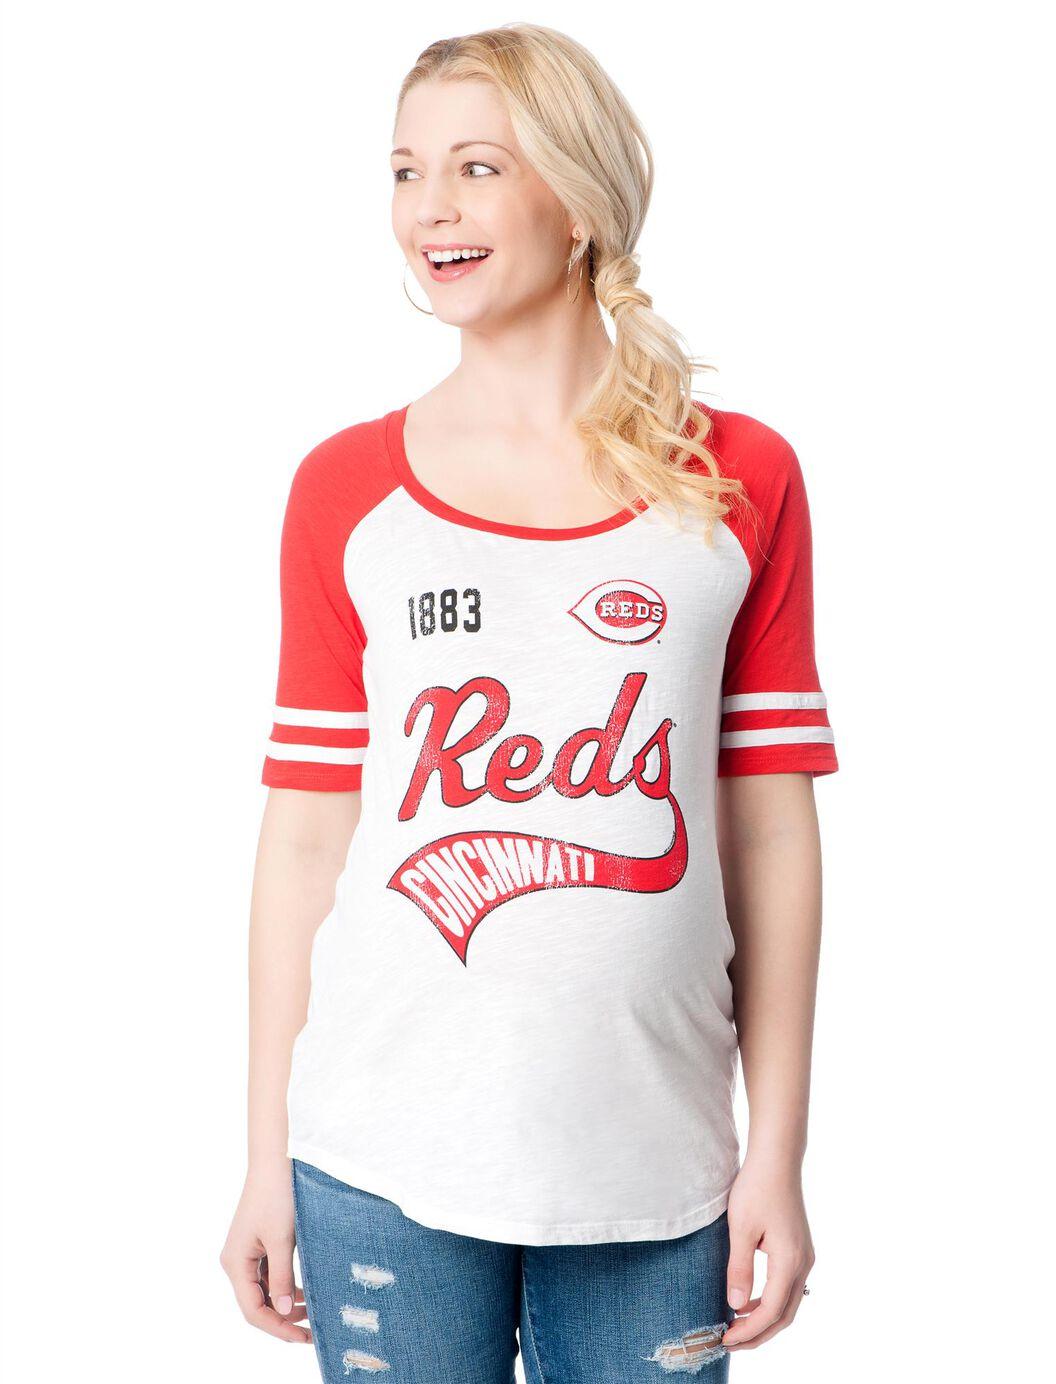 Cincinnati Reds MLB Raglan Elbow Sleeve Maternity Graphic Tee at Motherhood Maternity in Victor, NY | Tuggl